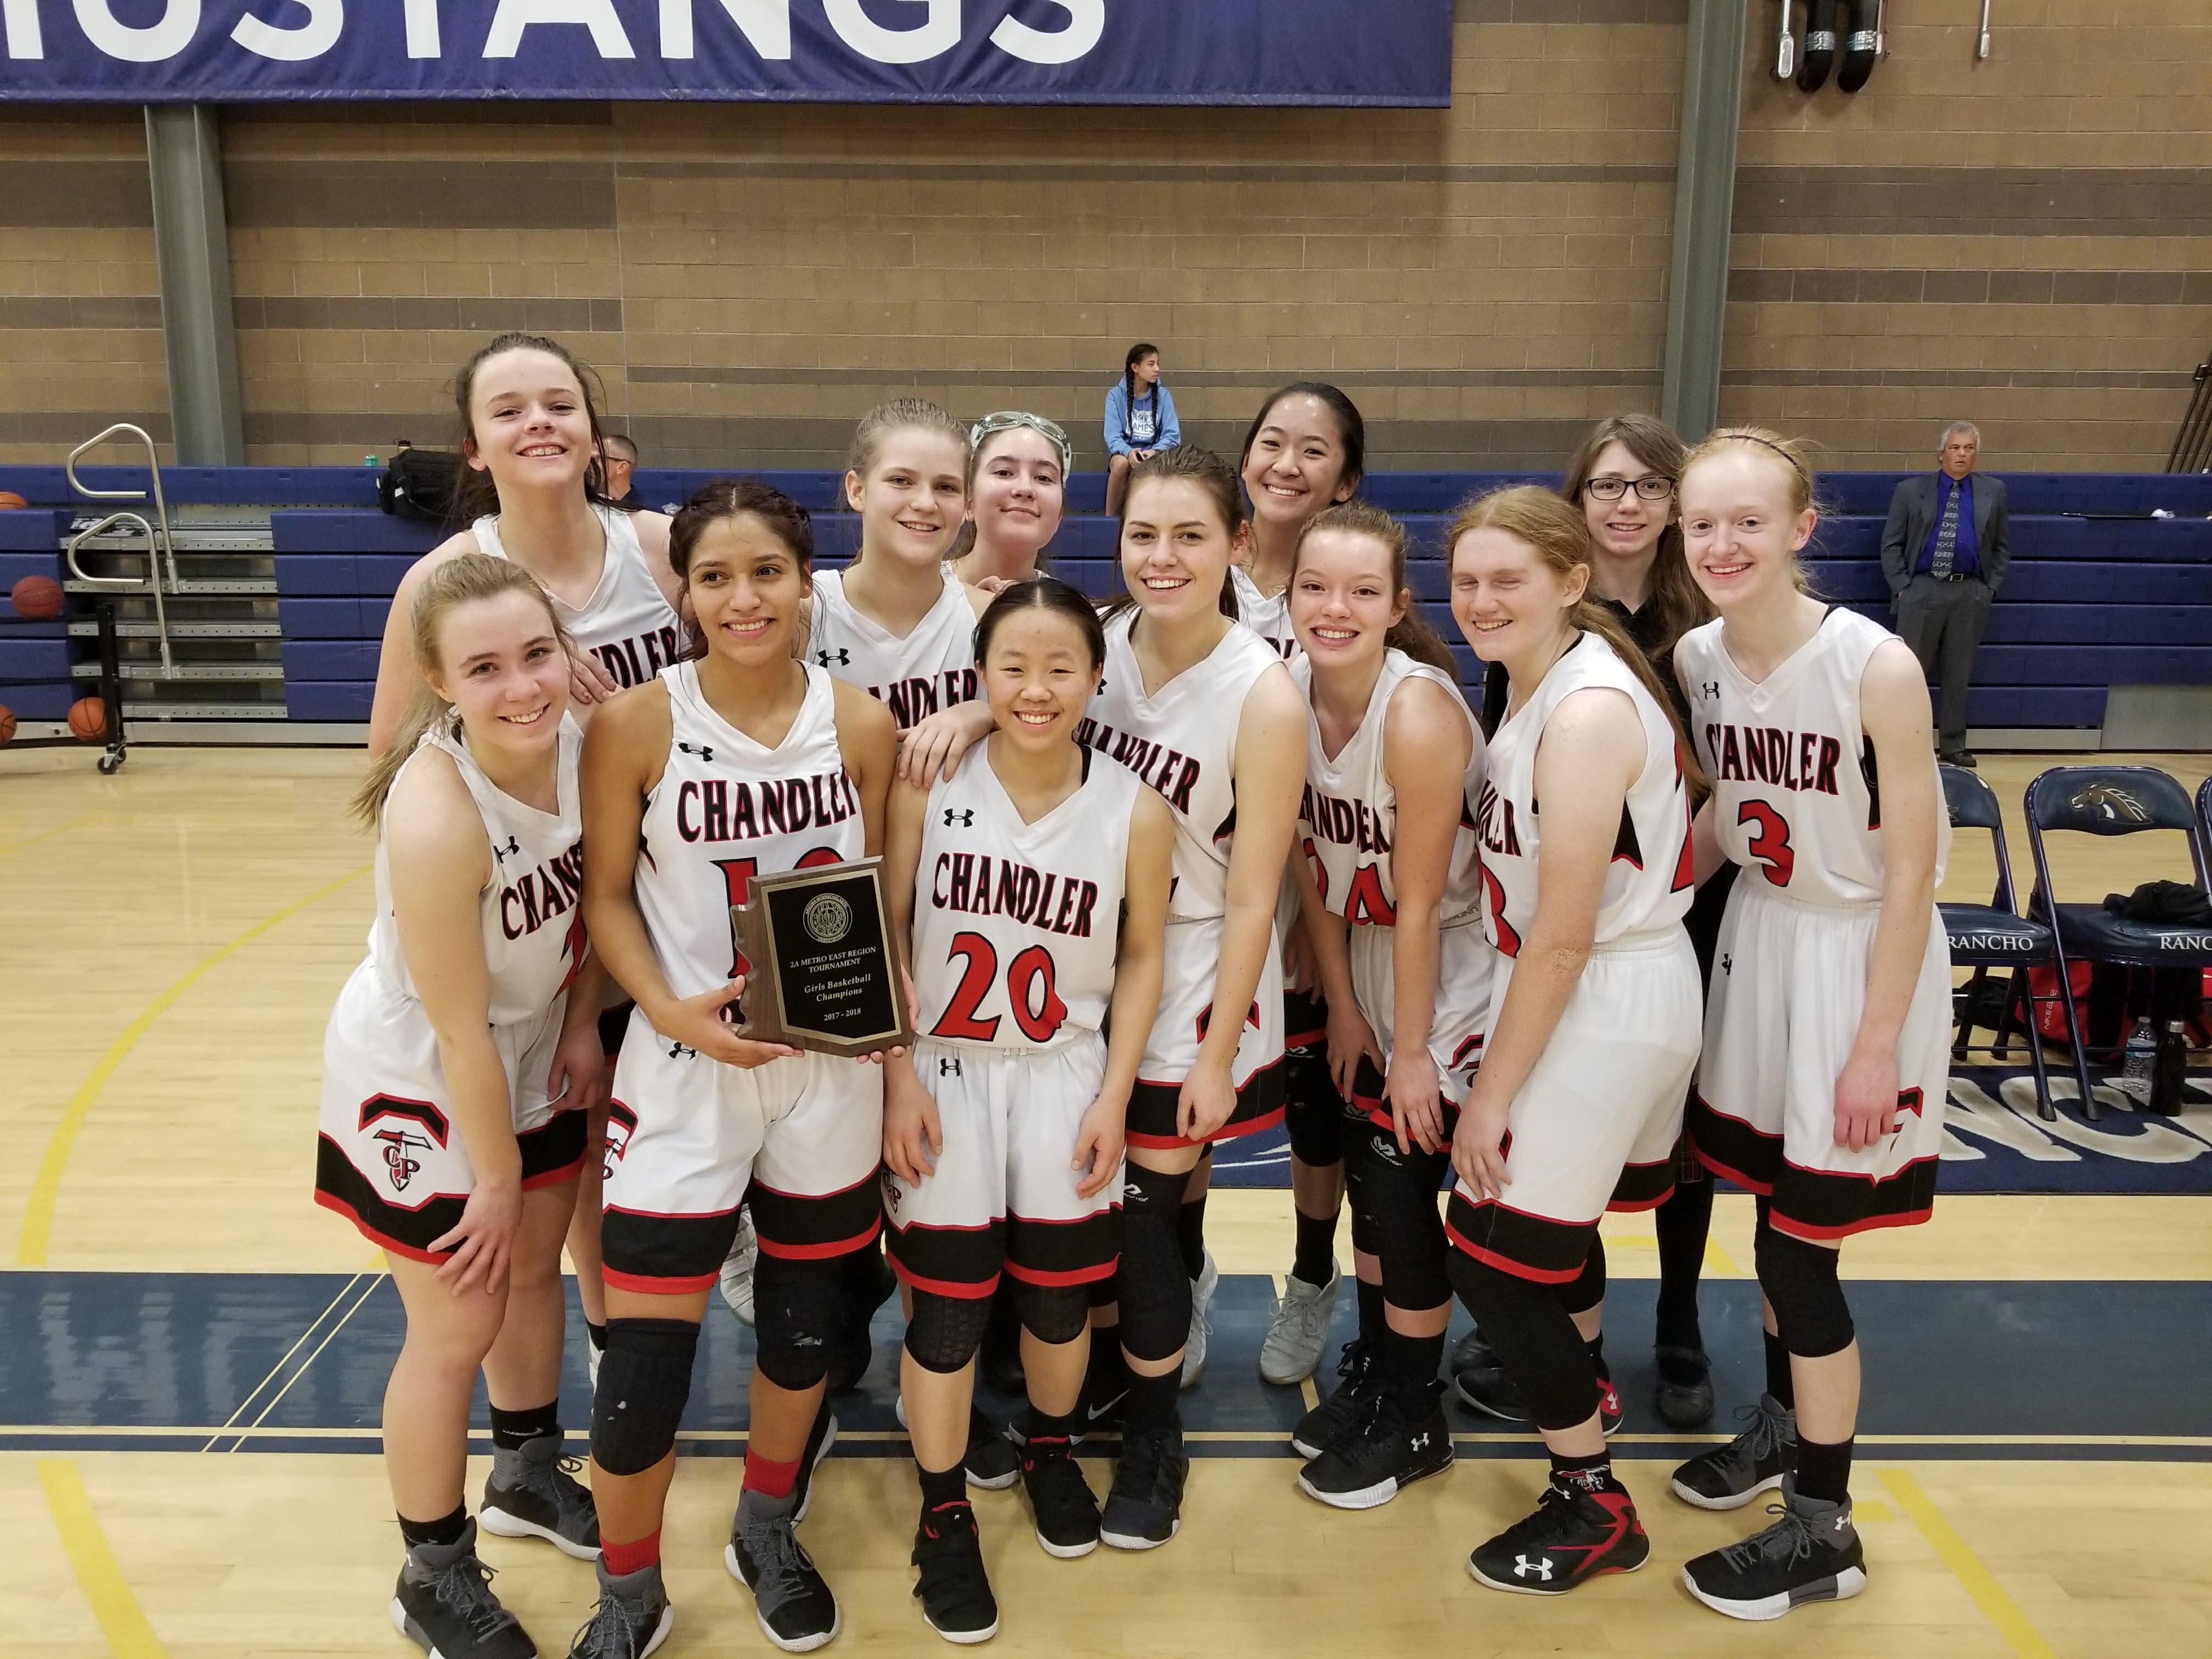 Girls Basketball WINS Region: 19-0